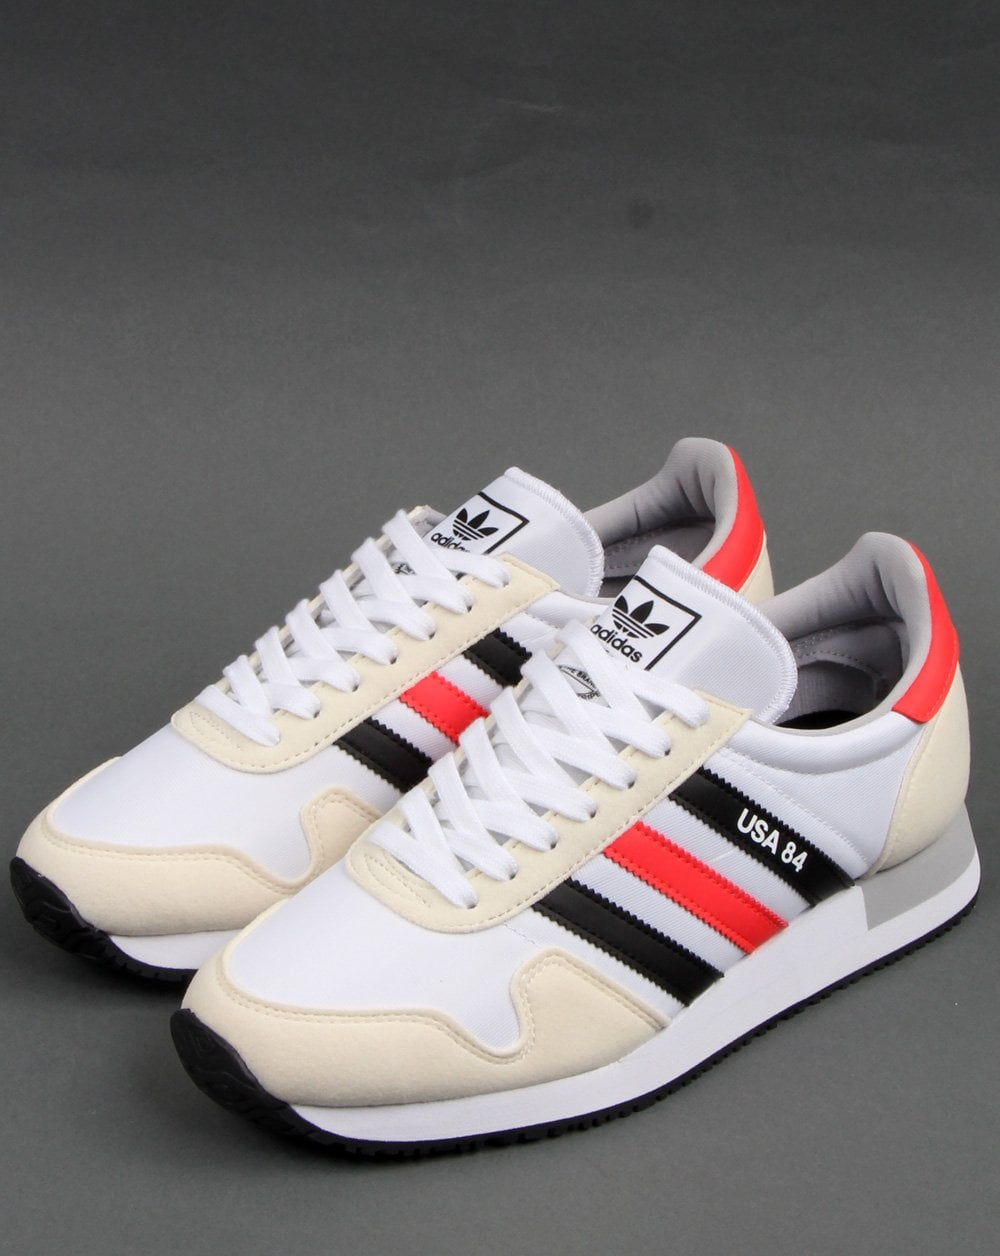 adidas 84 trainer